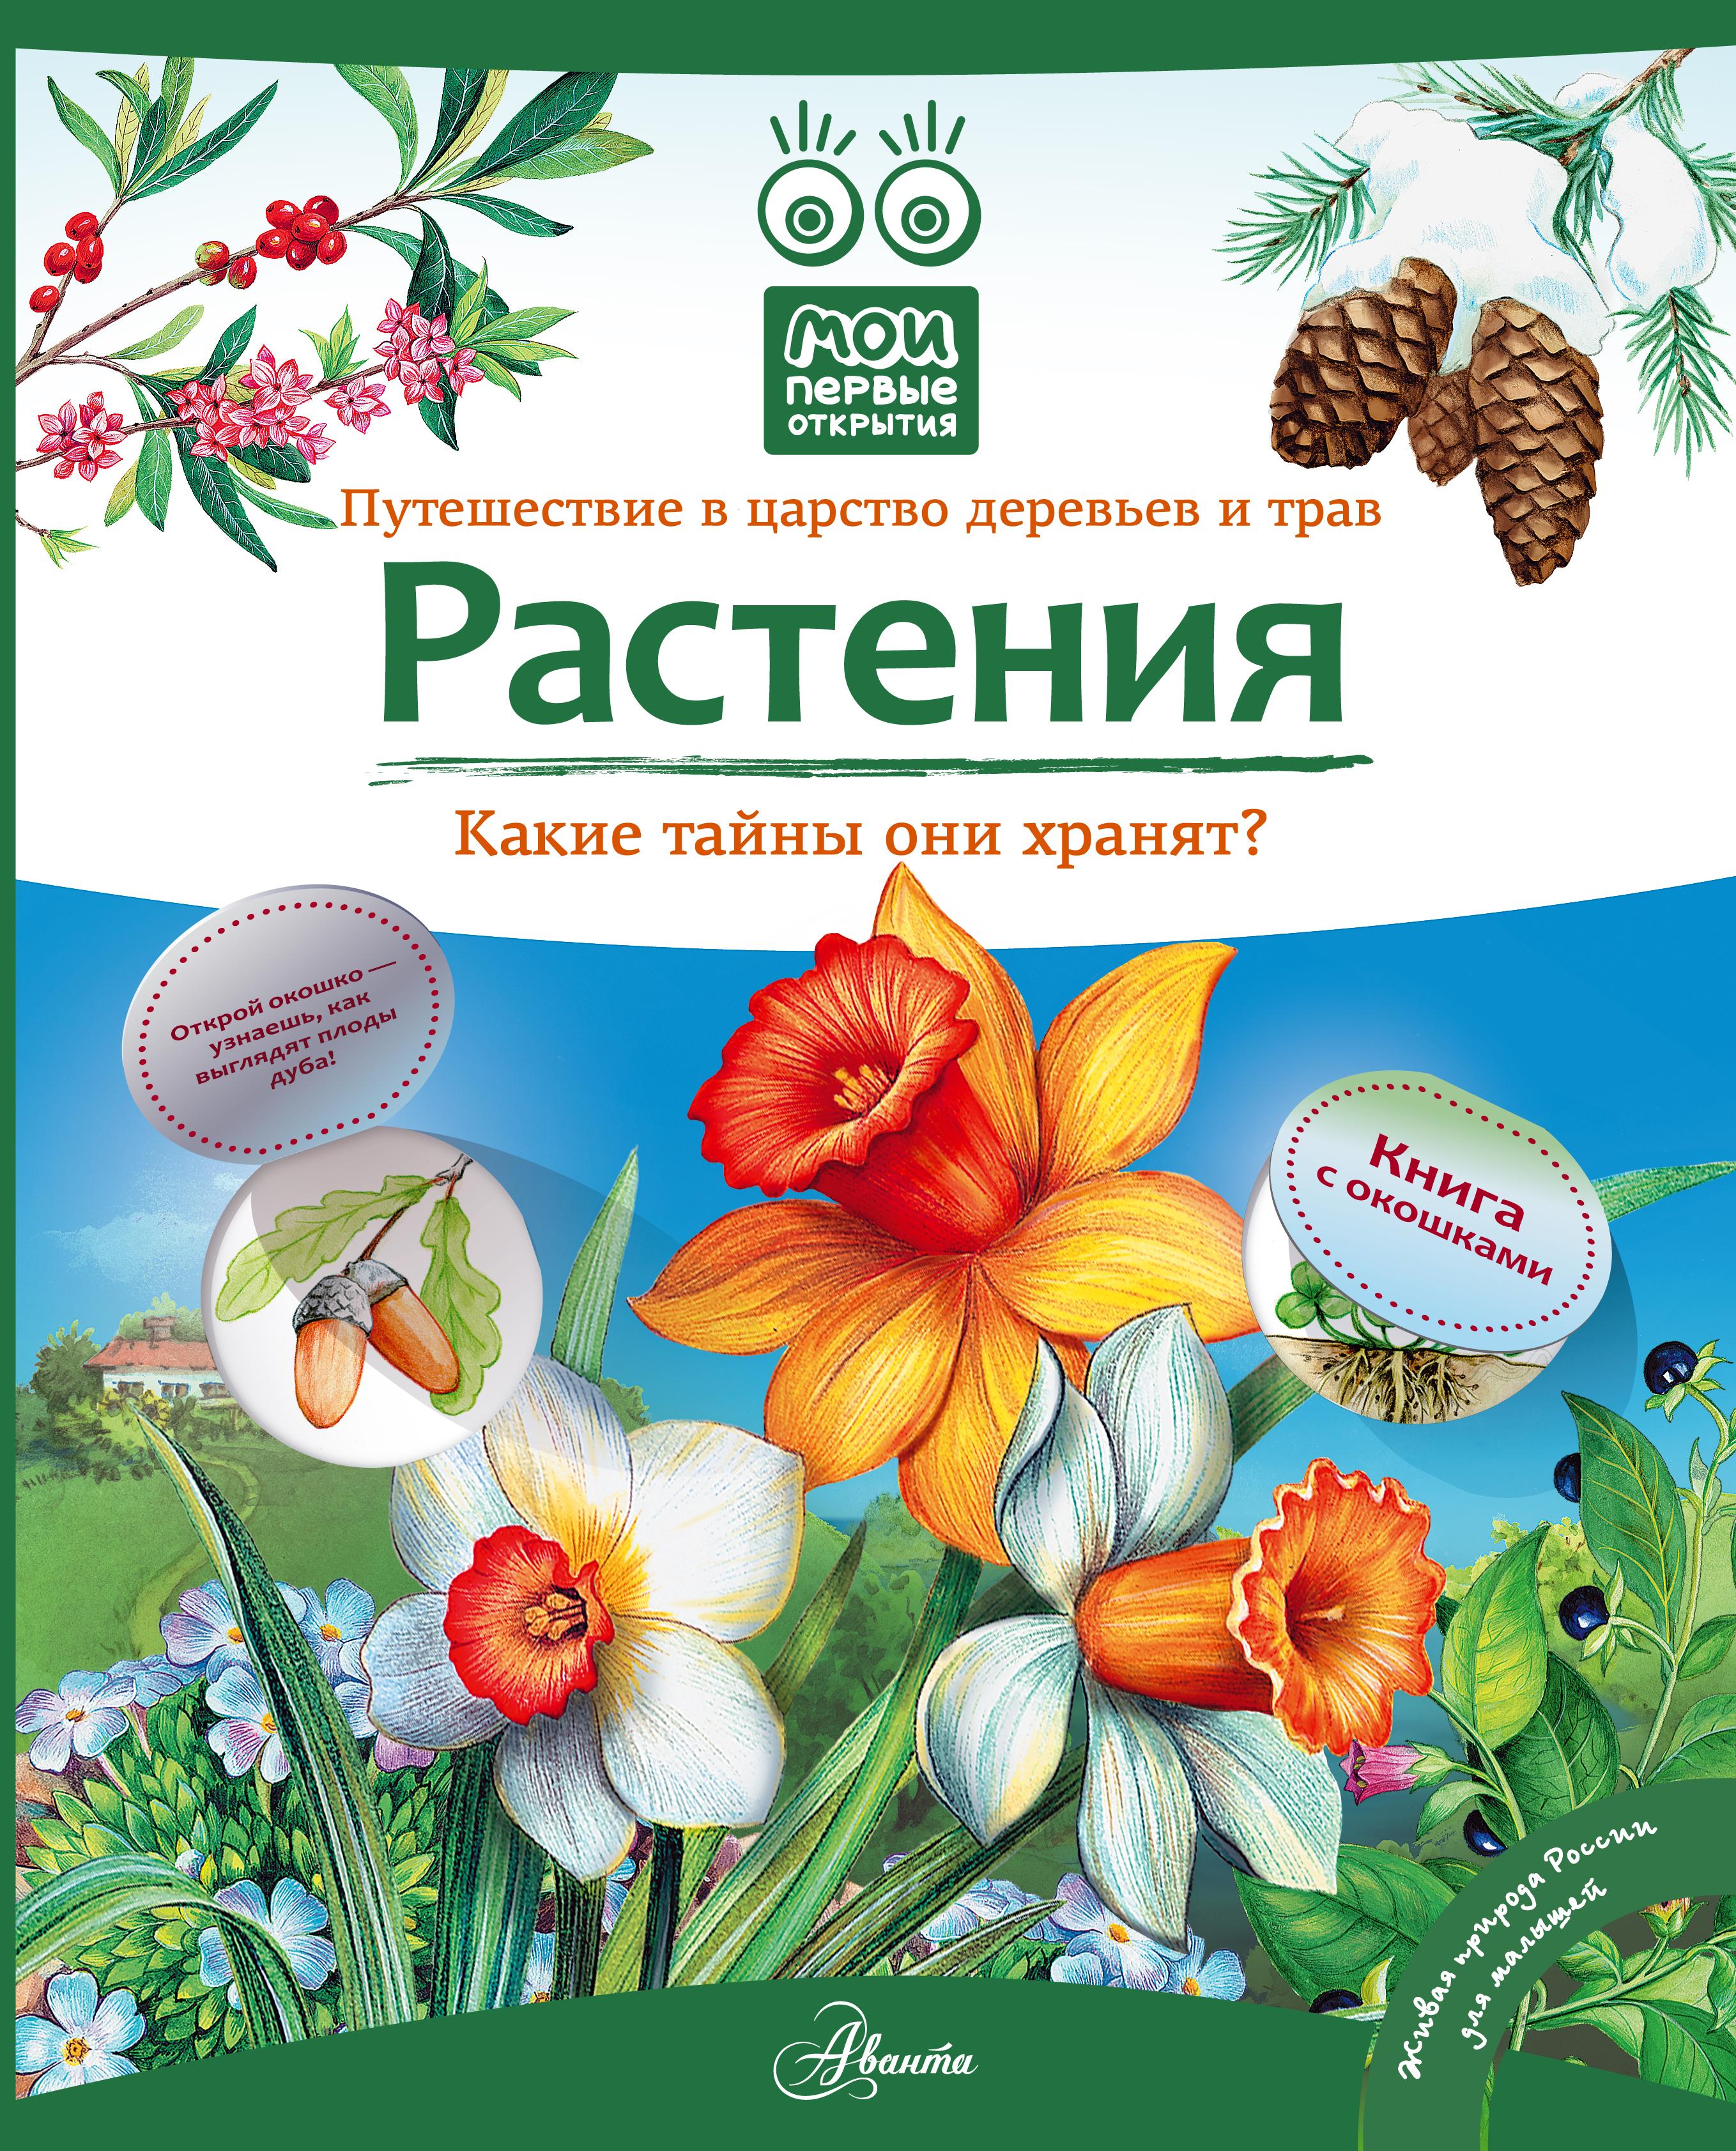 Растения. Книга с окошками